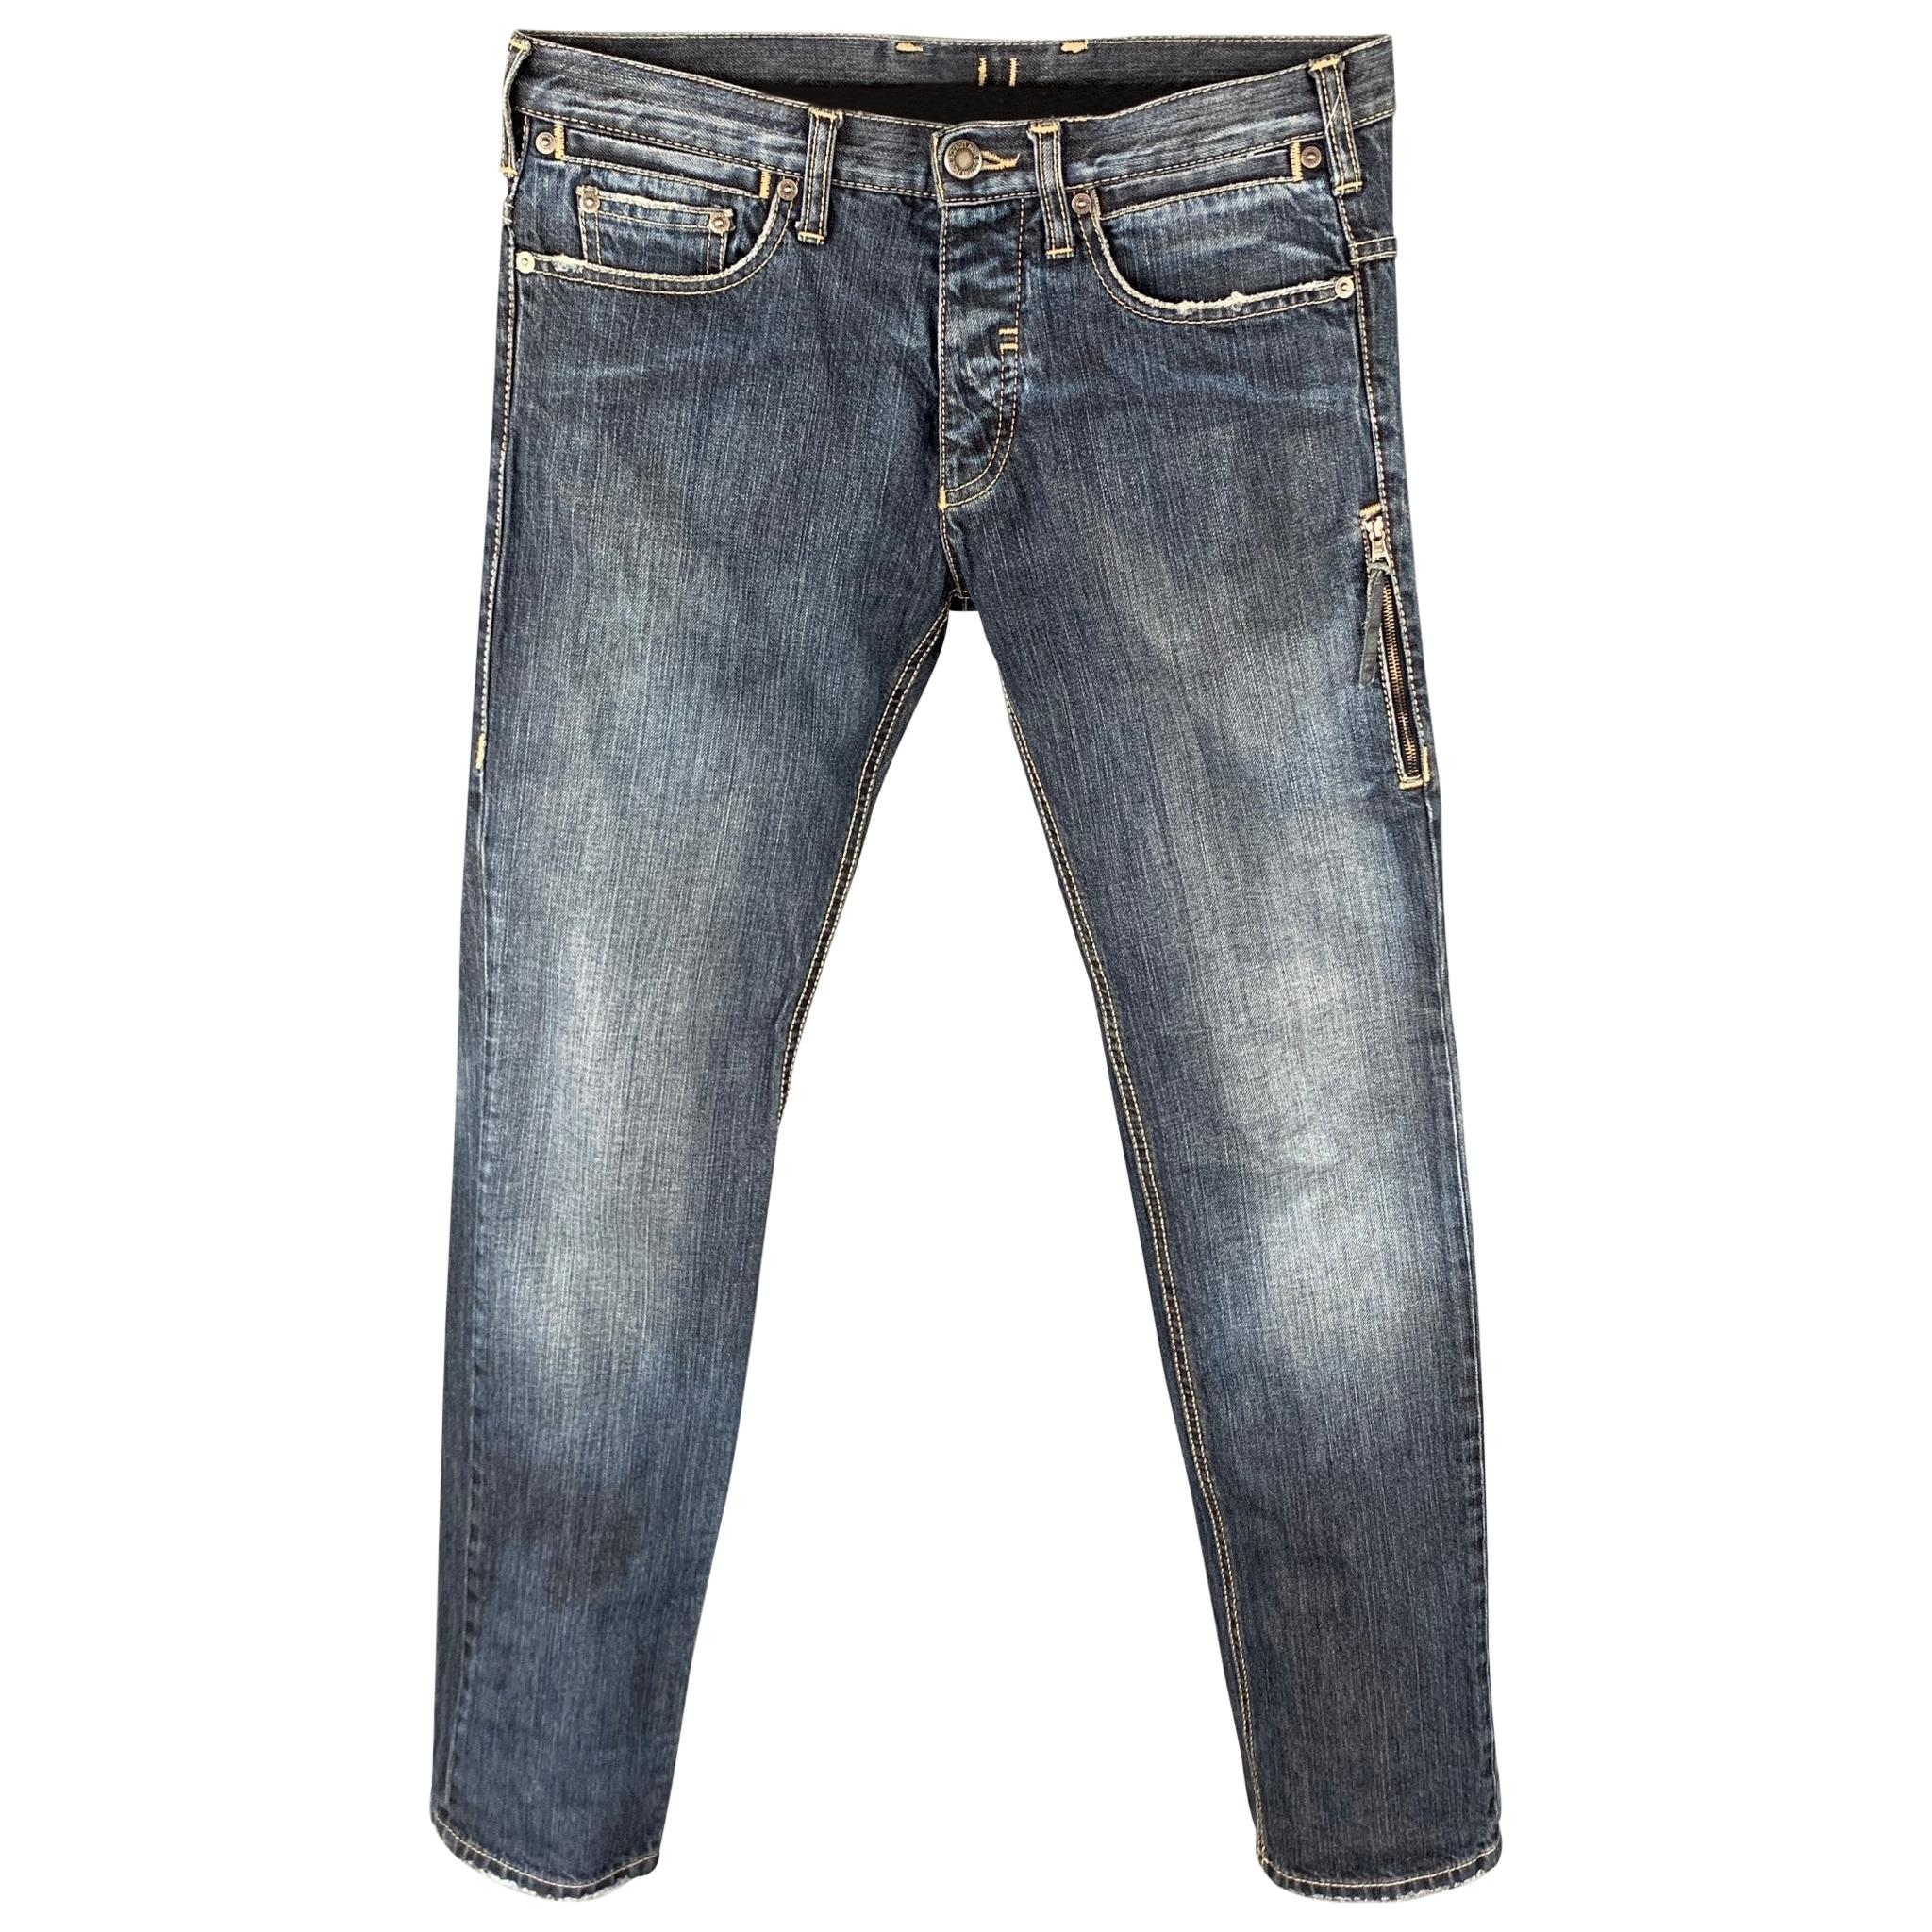 NEIL BARRETT Size 30 Indigo Distressed Denim Button Fly Jeans